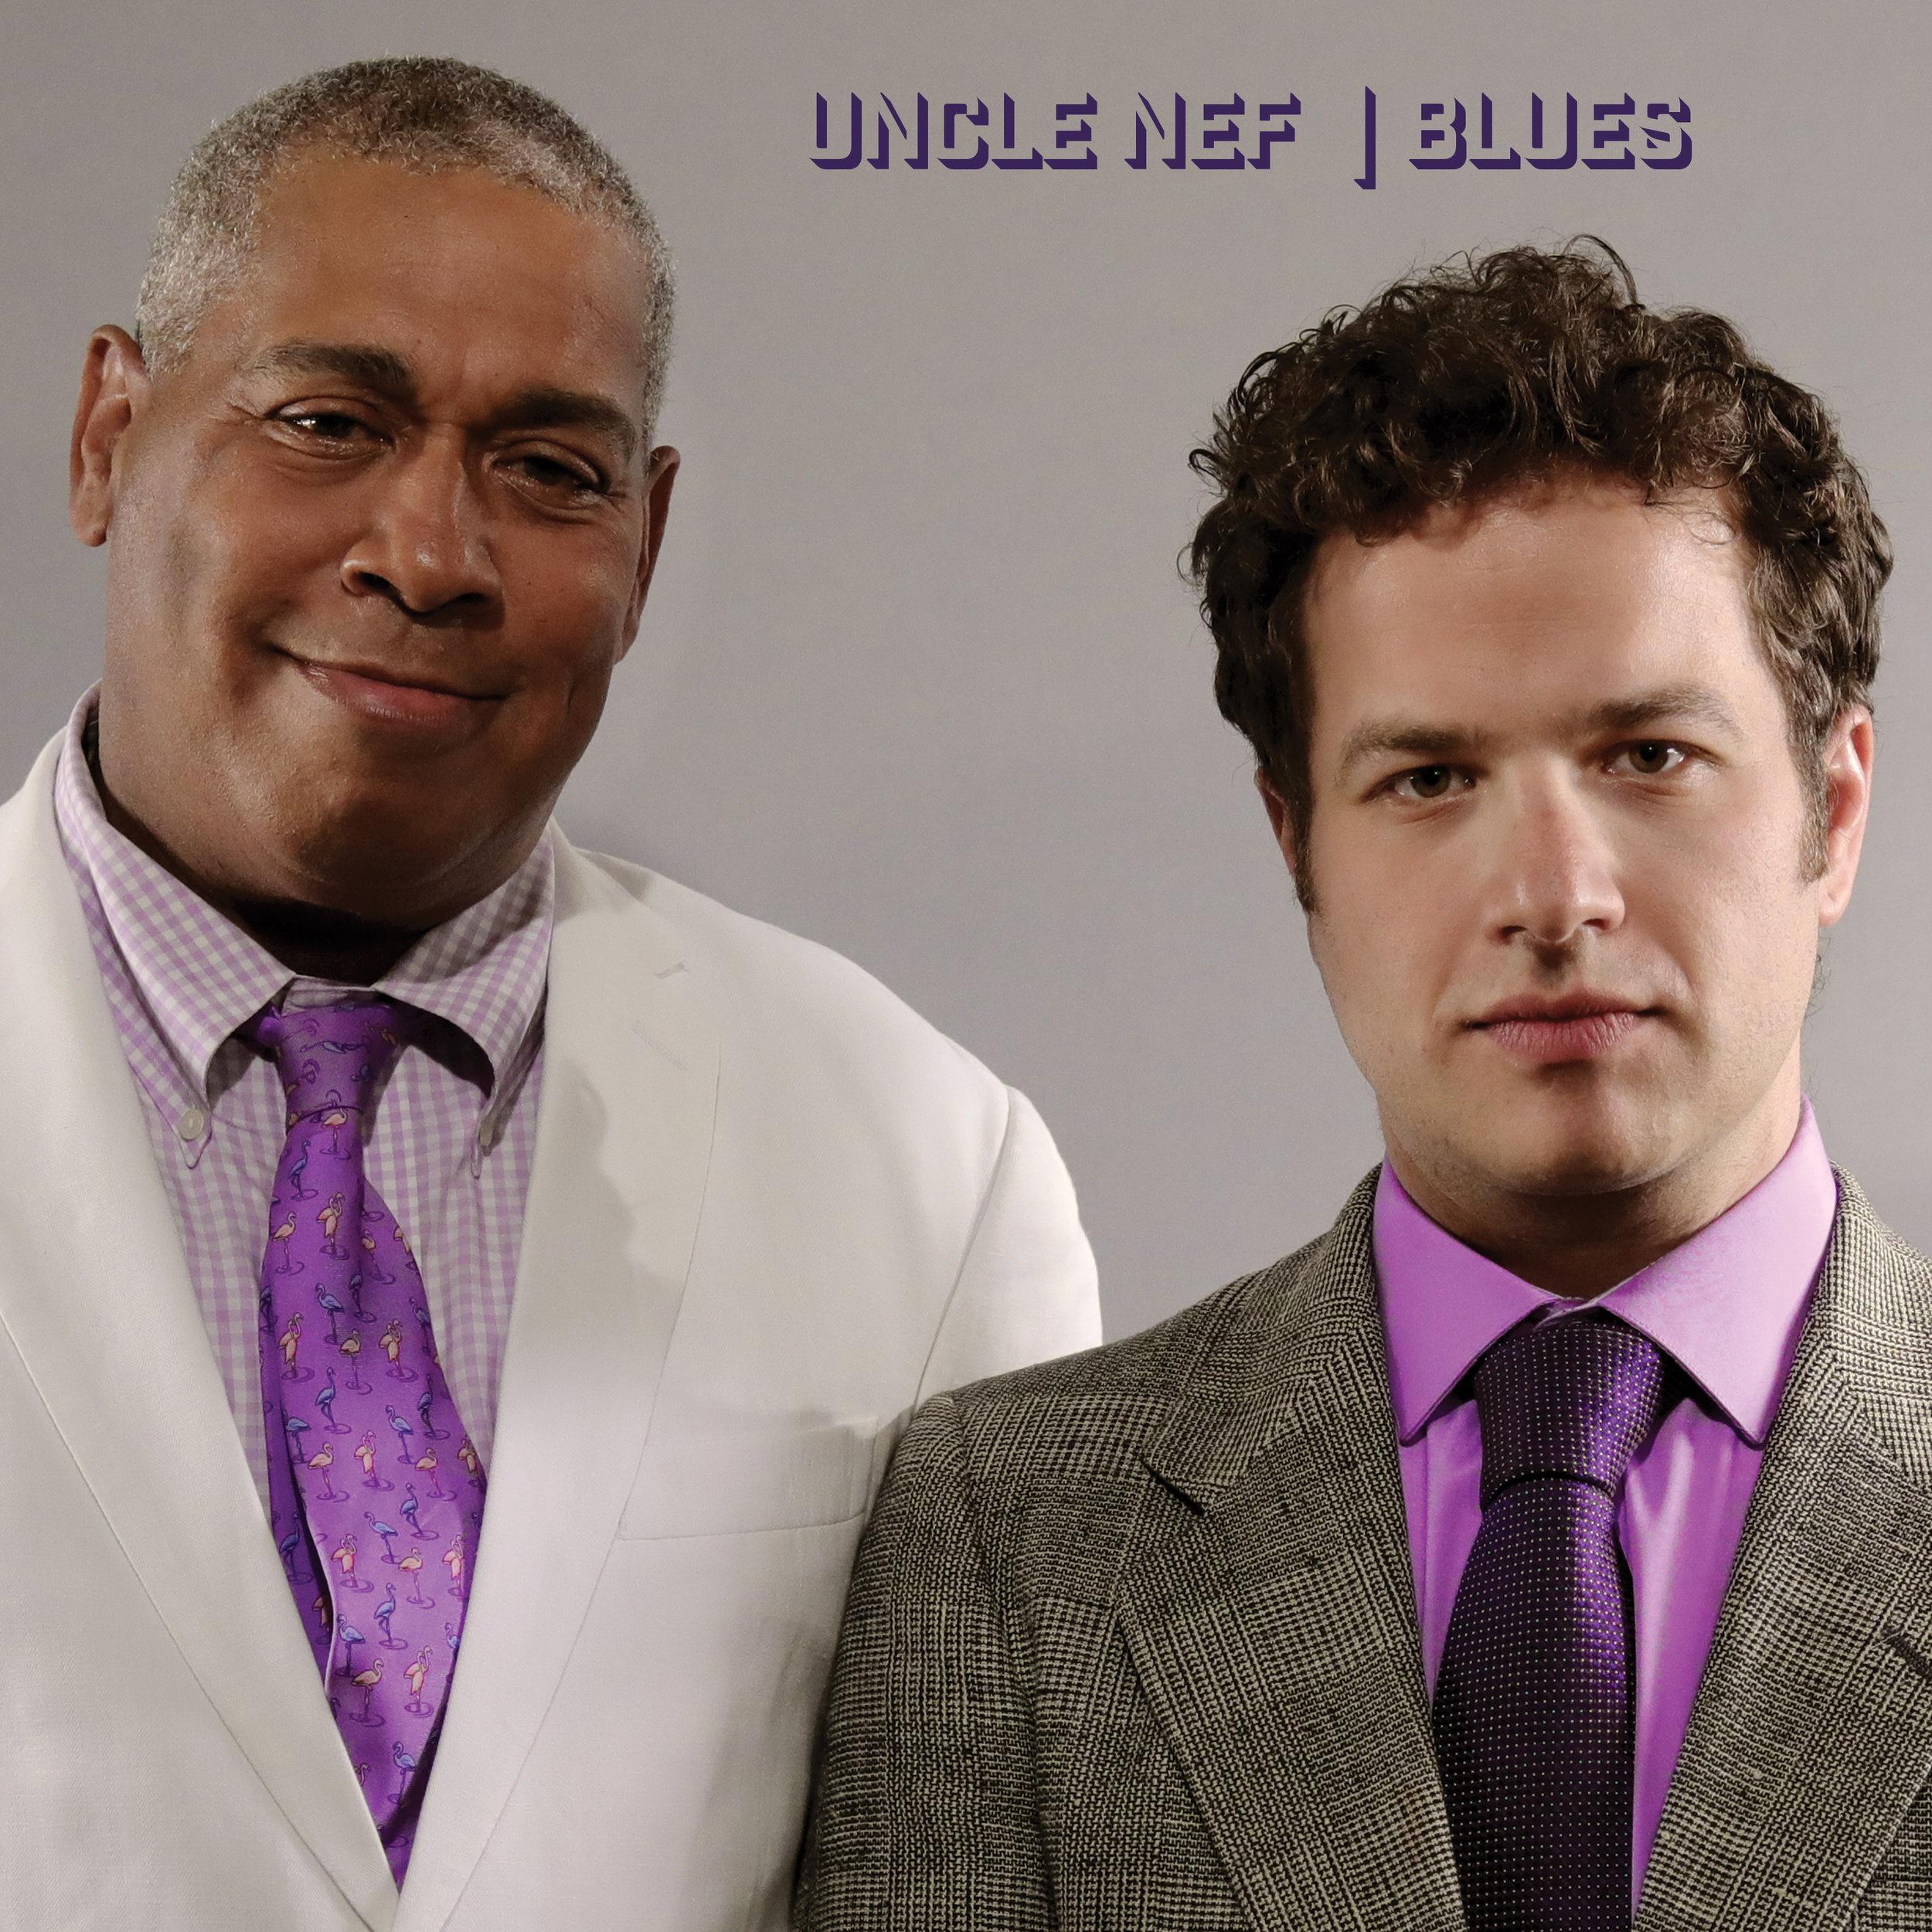 Uncle Nef - Blues - Album Art - Front Cover - For Digital 3000x3000.jpg